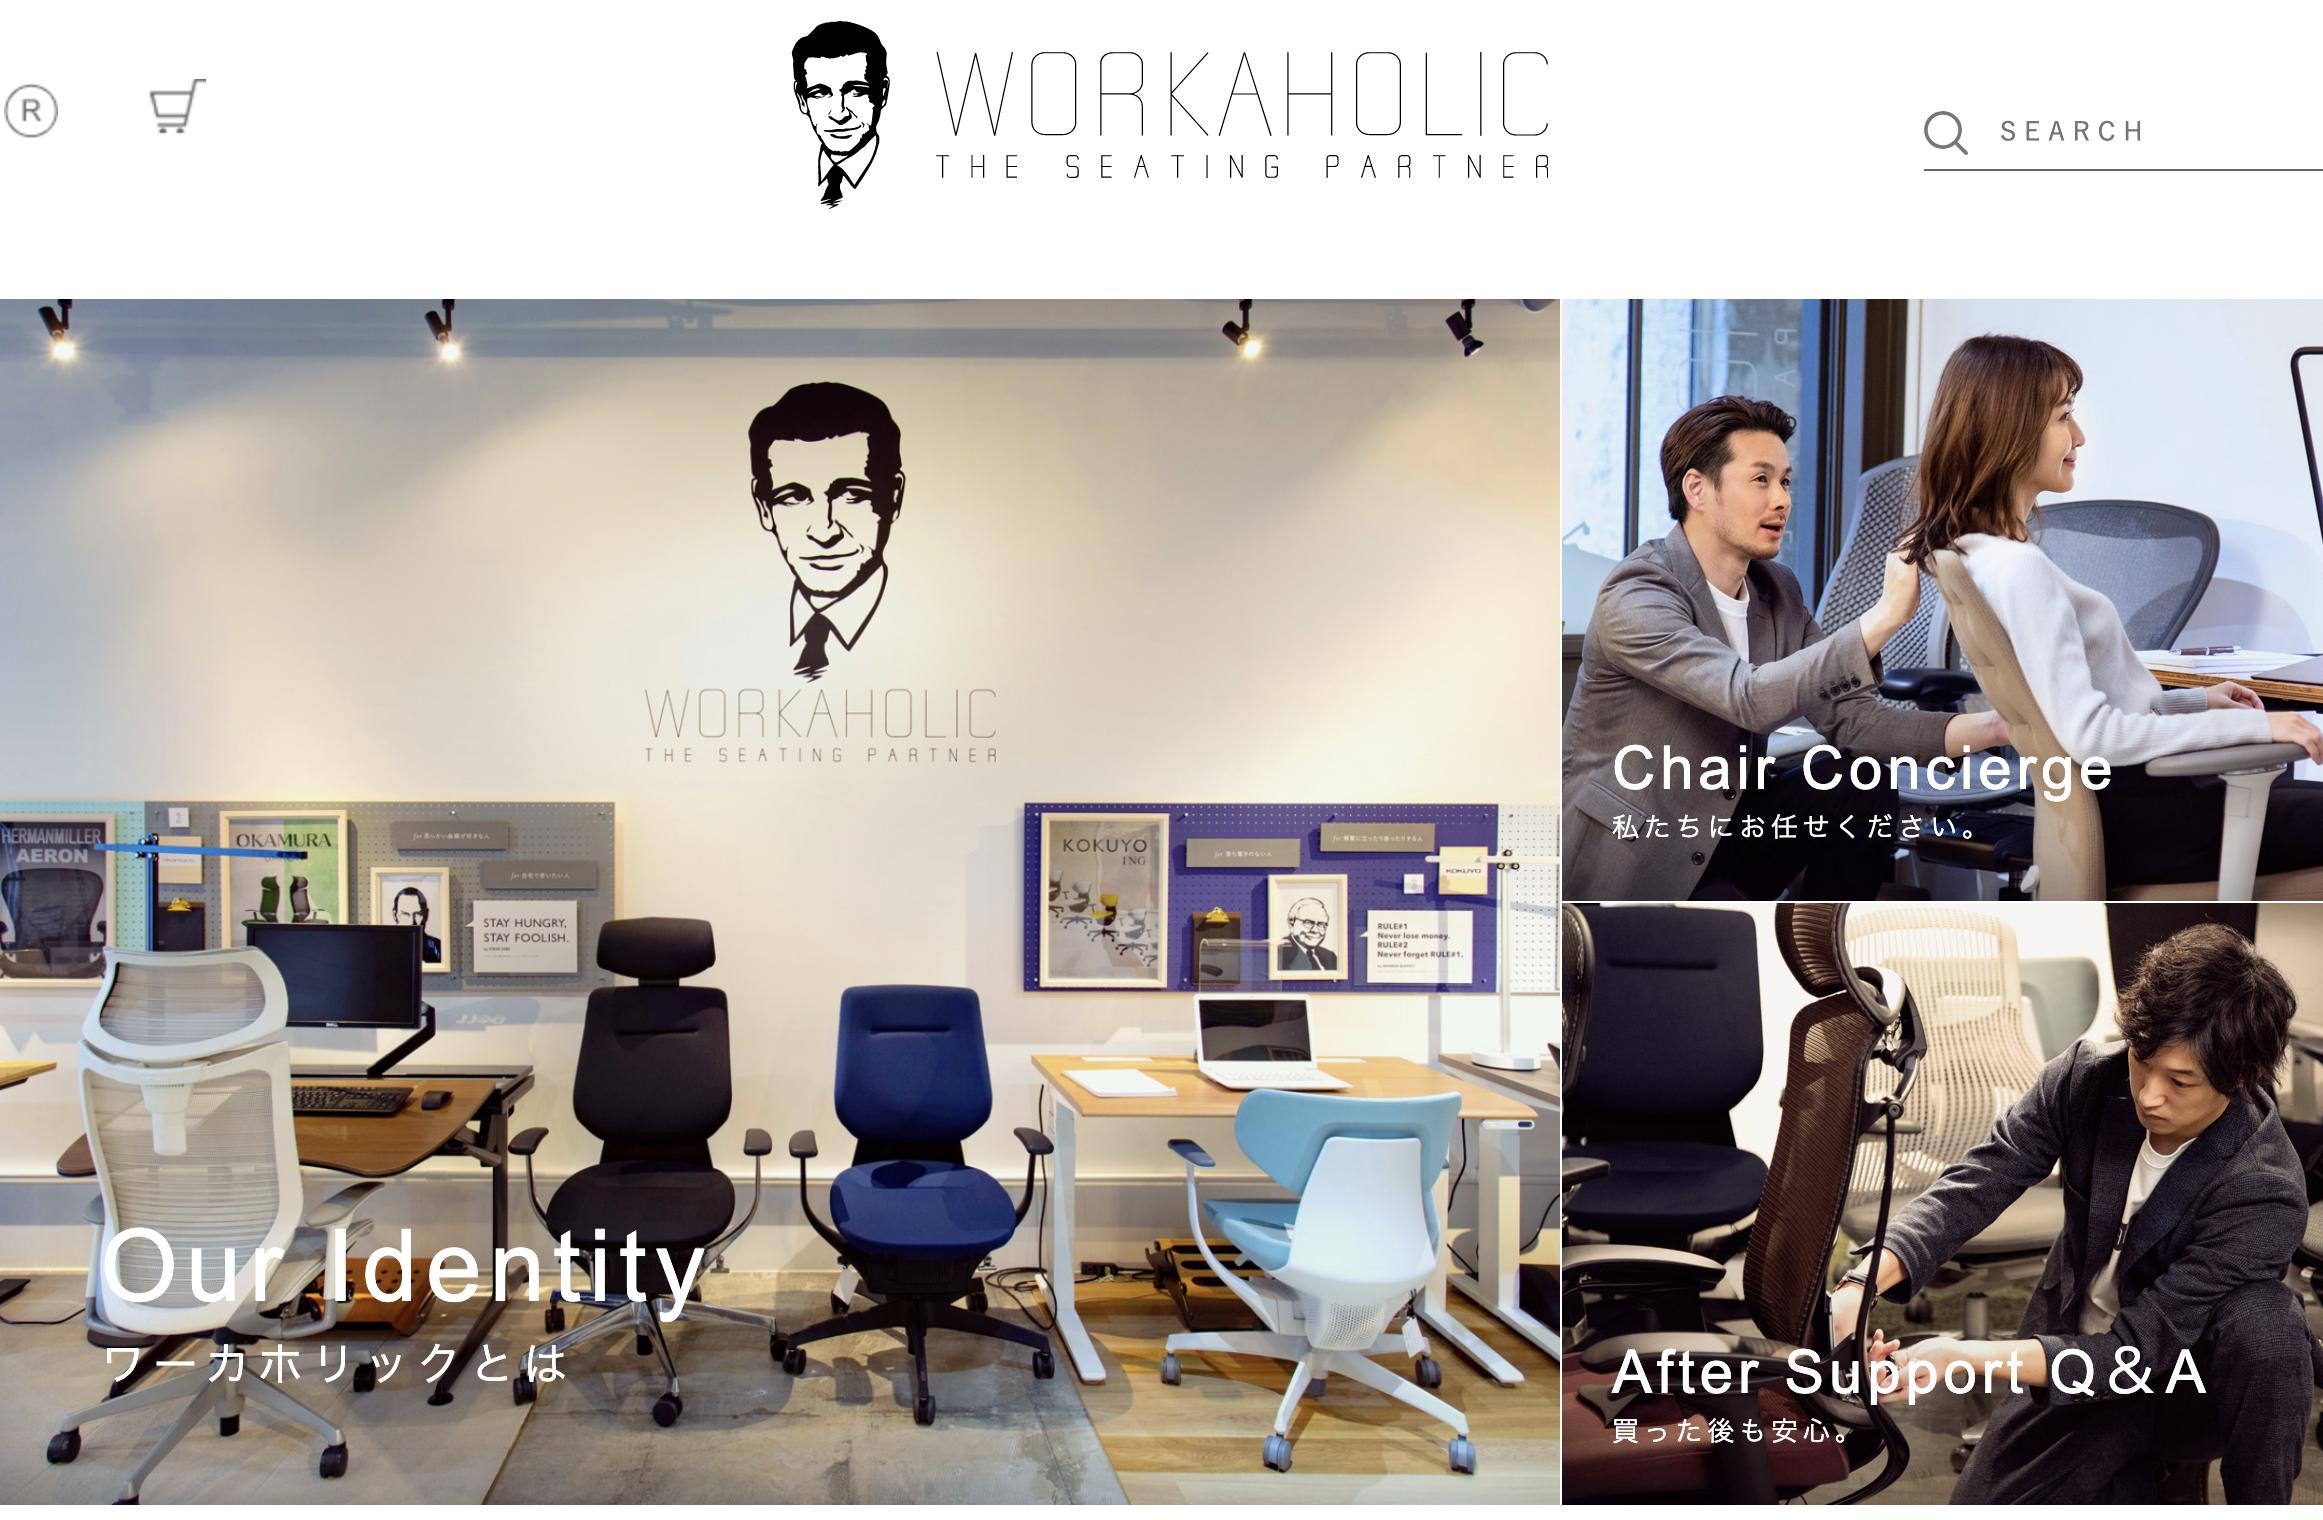 workaholic楽天市場店トップページ